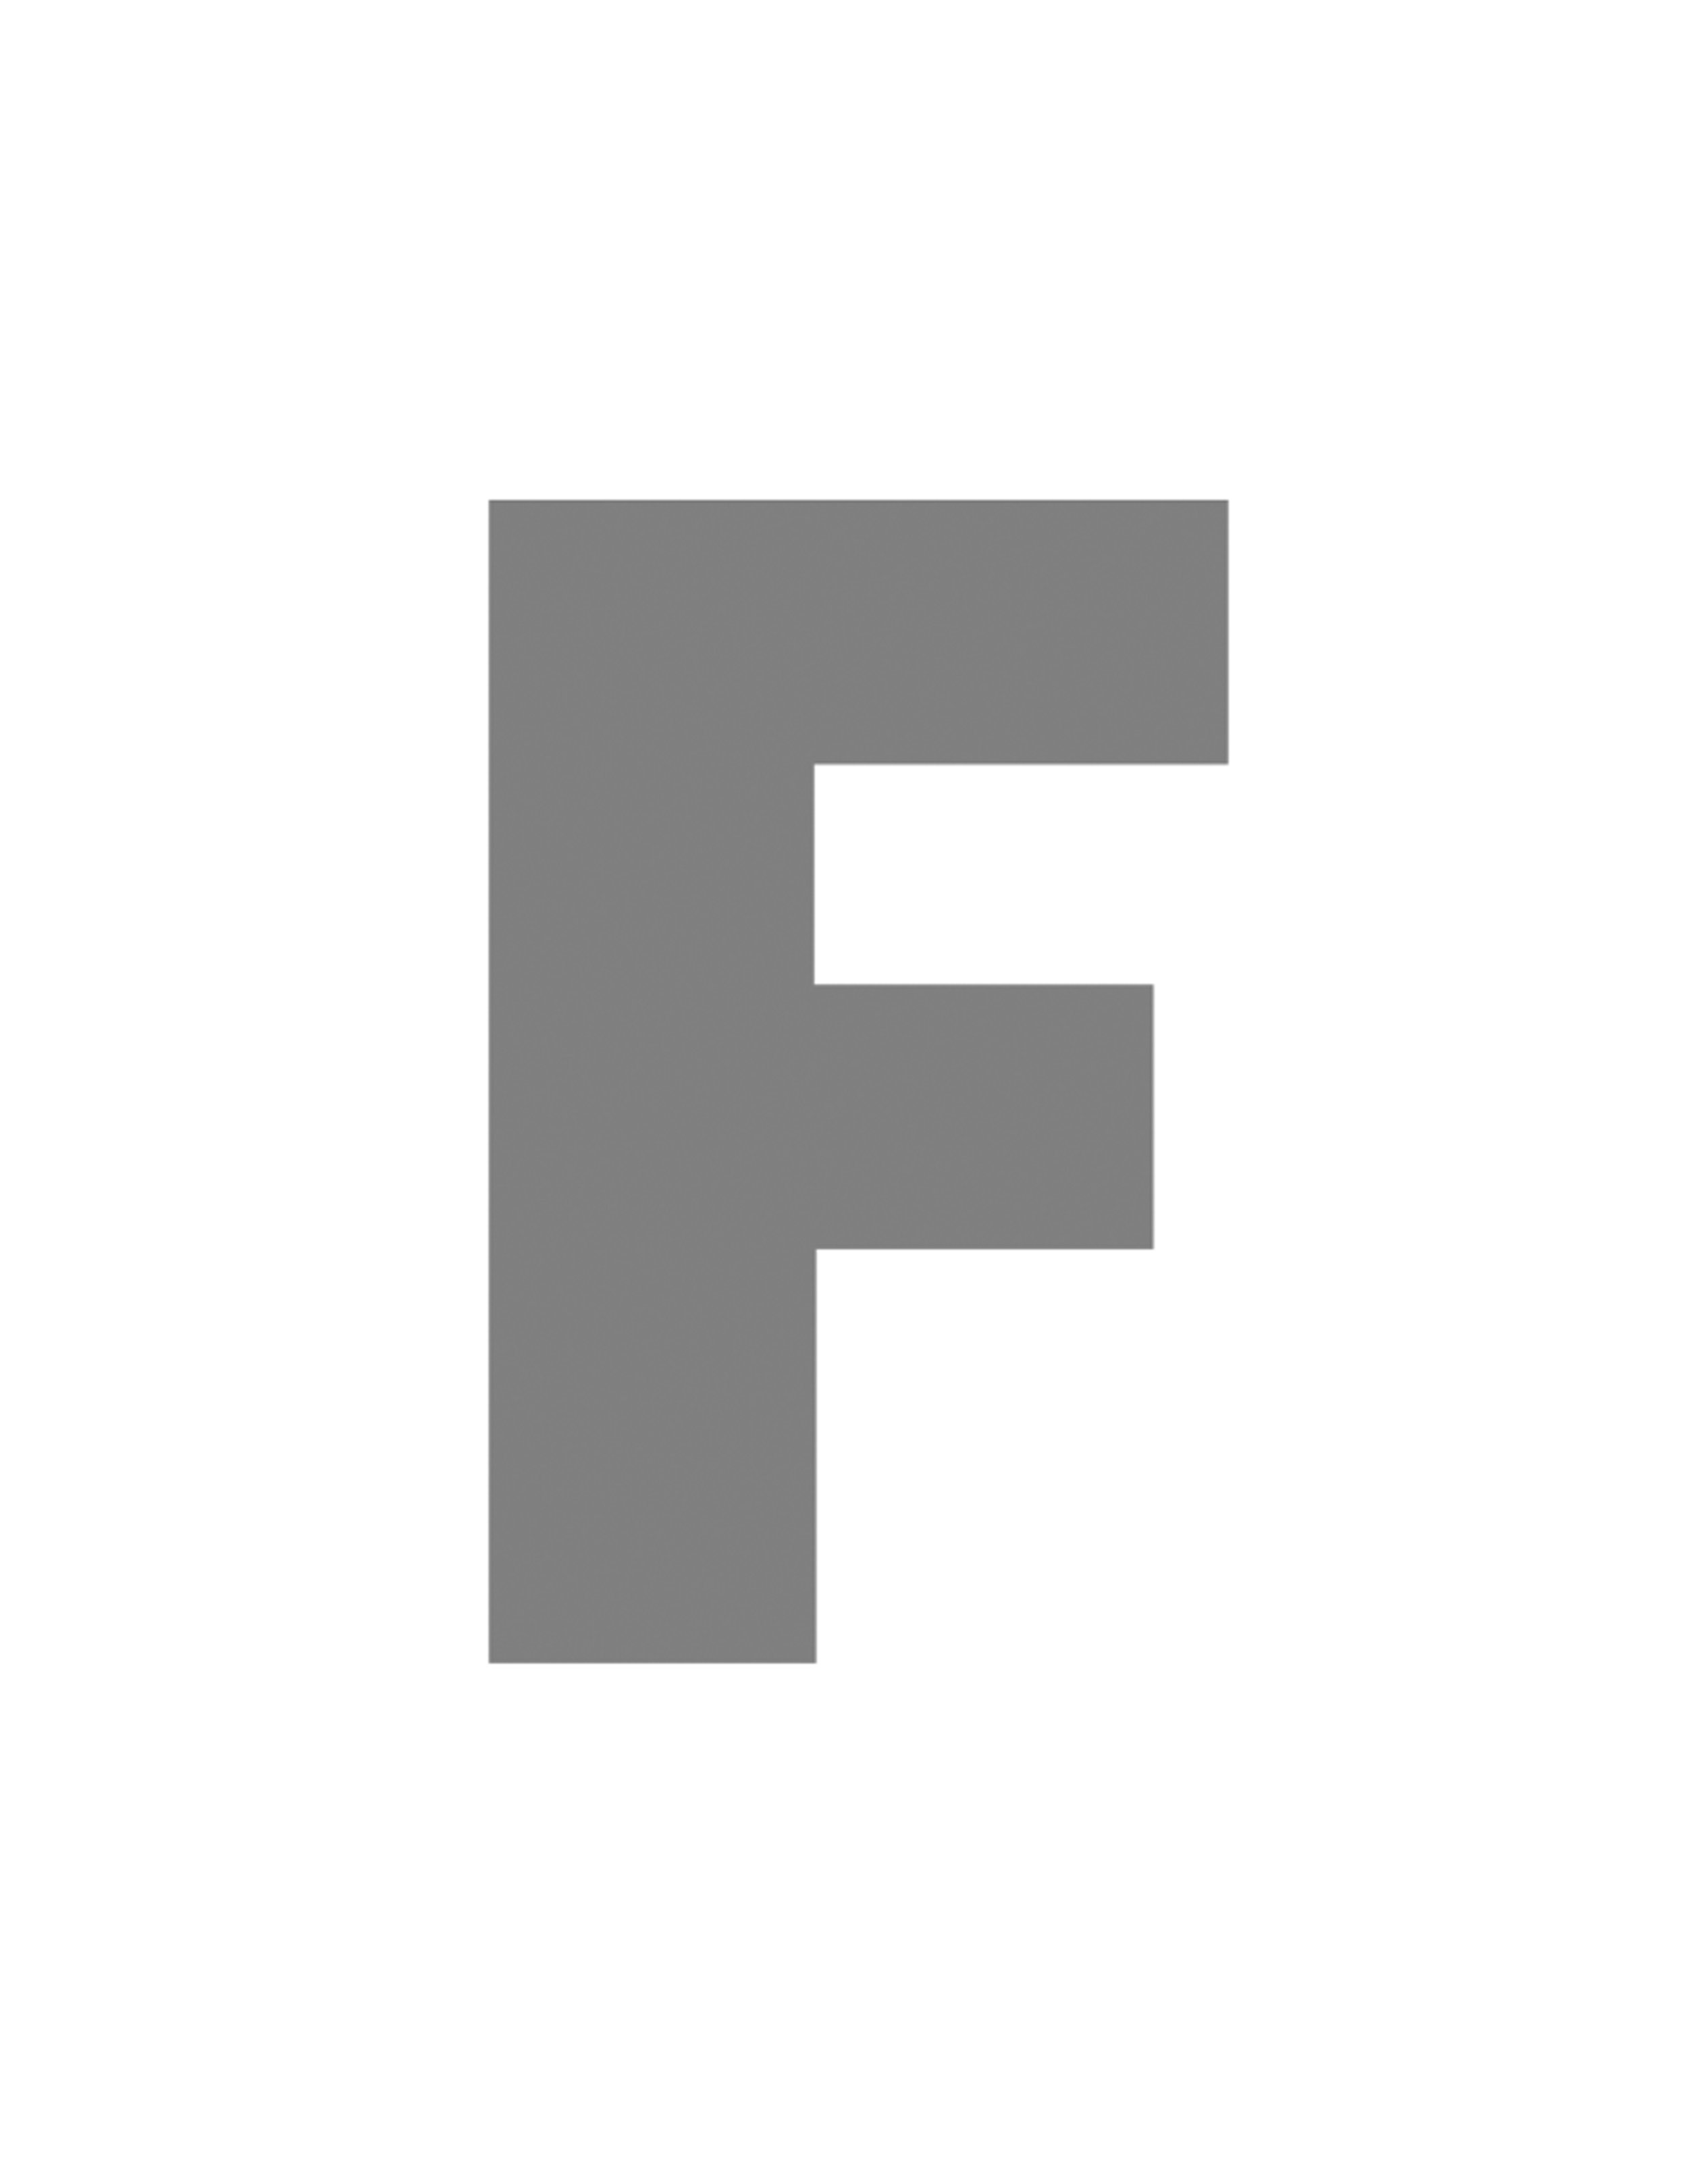 F_4_cover.jpg